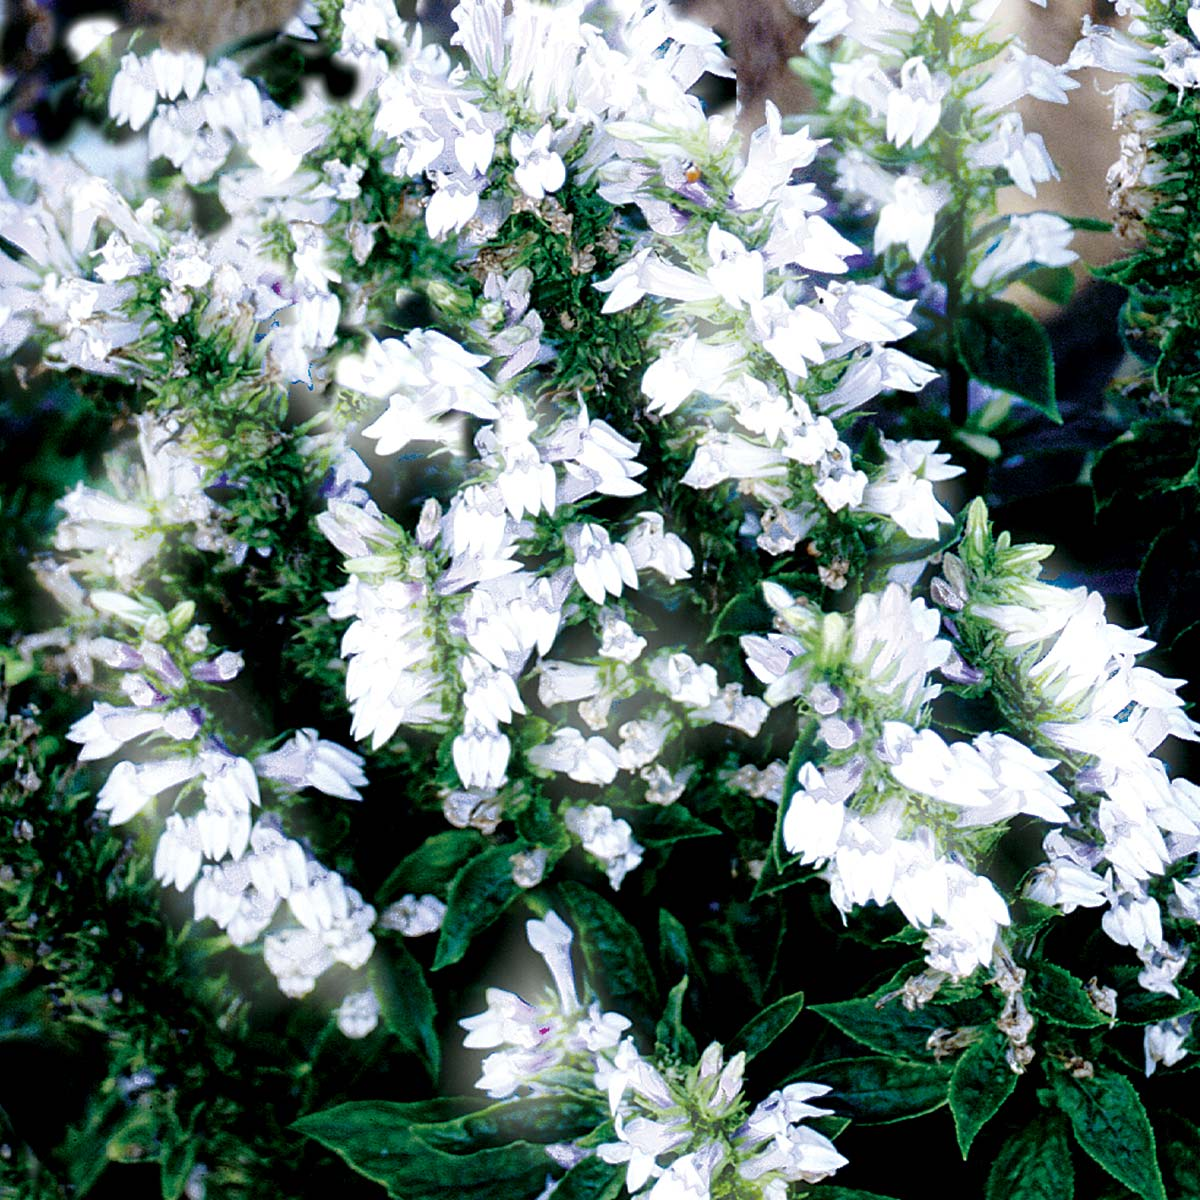 Lobelia 'White Candles'